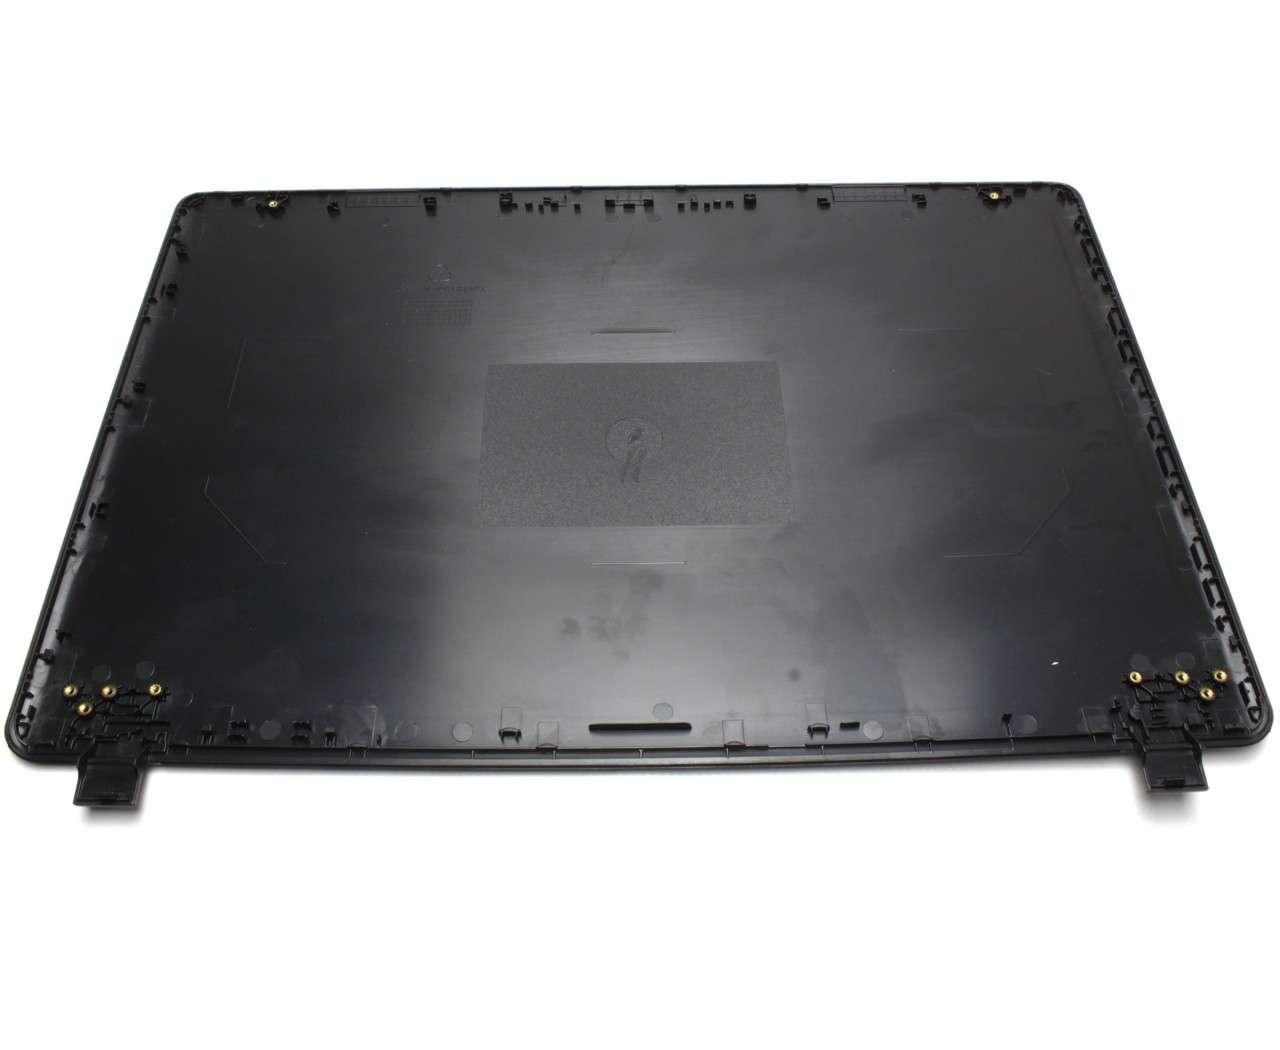 Capac Display BackCover Acer Aspire ES1-532G Carcasa Display imagine powerlaptop.ro 2021